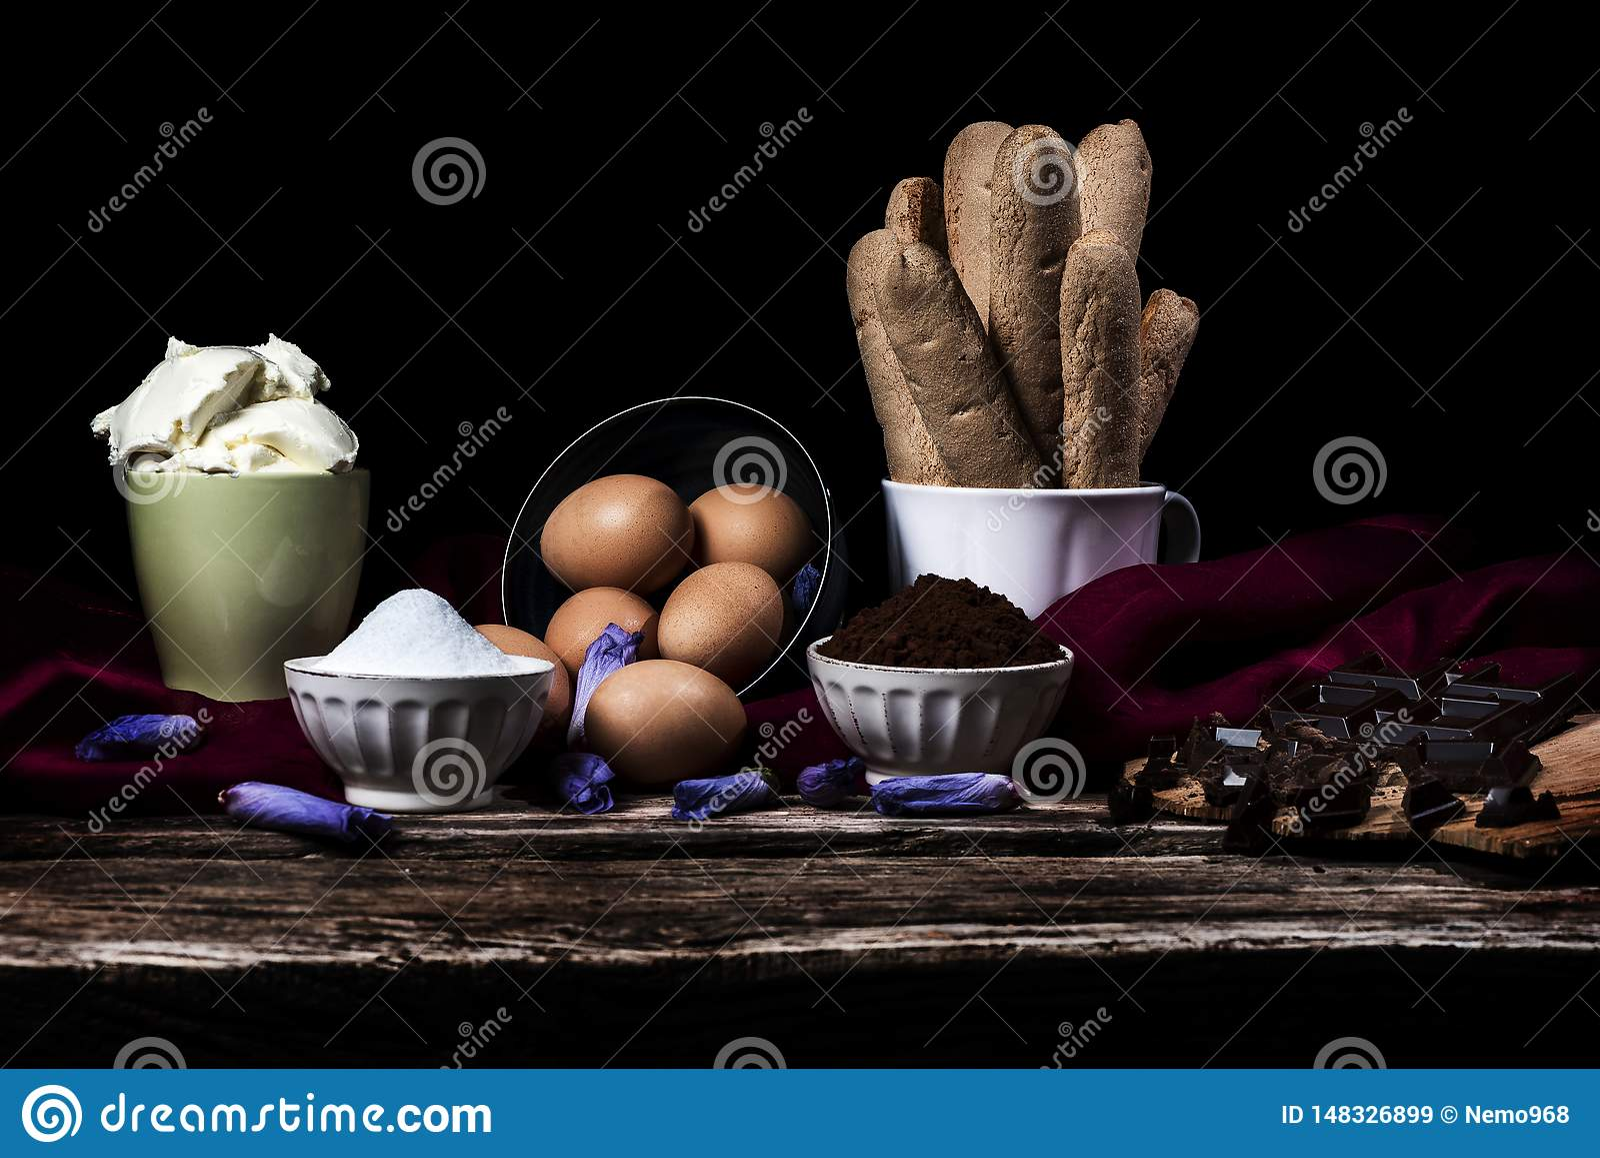 Ingredients for Italian tiramisu, chocolate, coffee and mascarpone on a black background